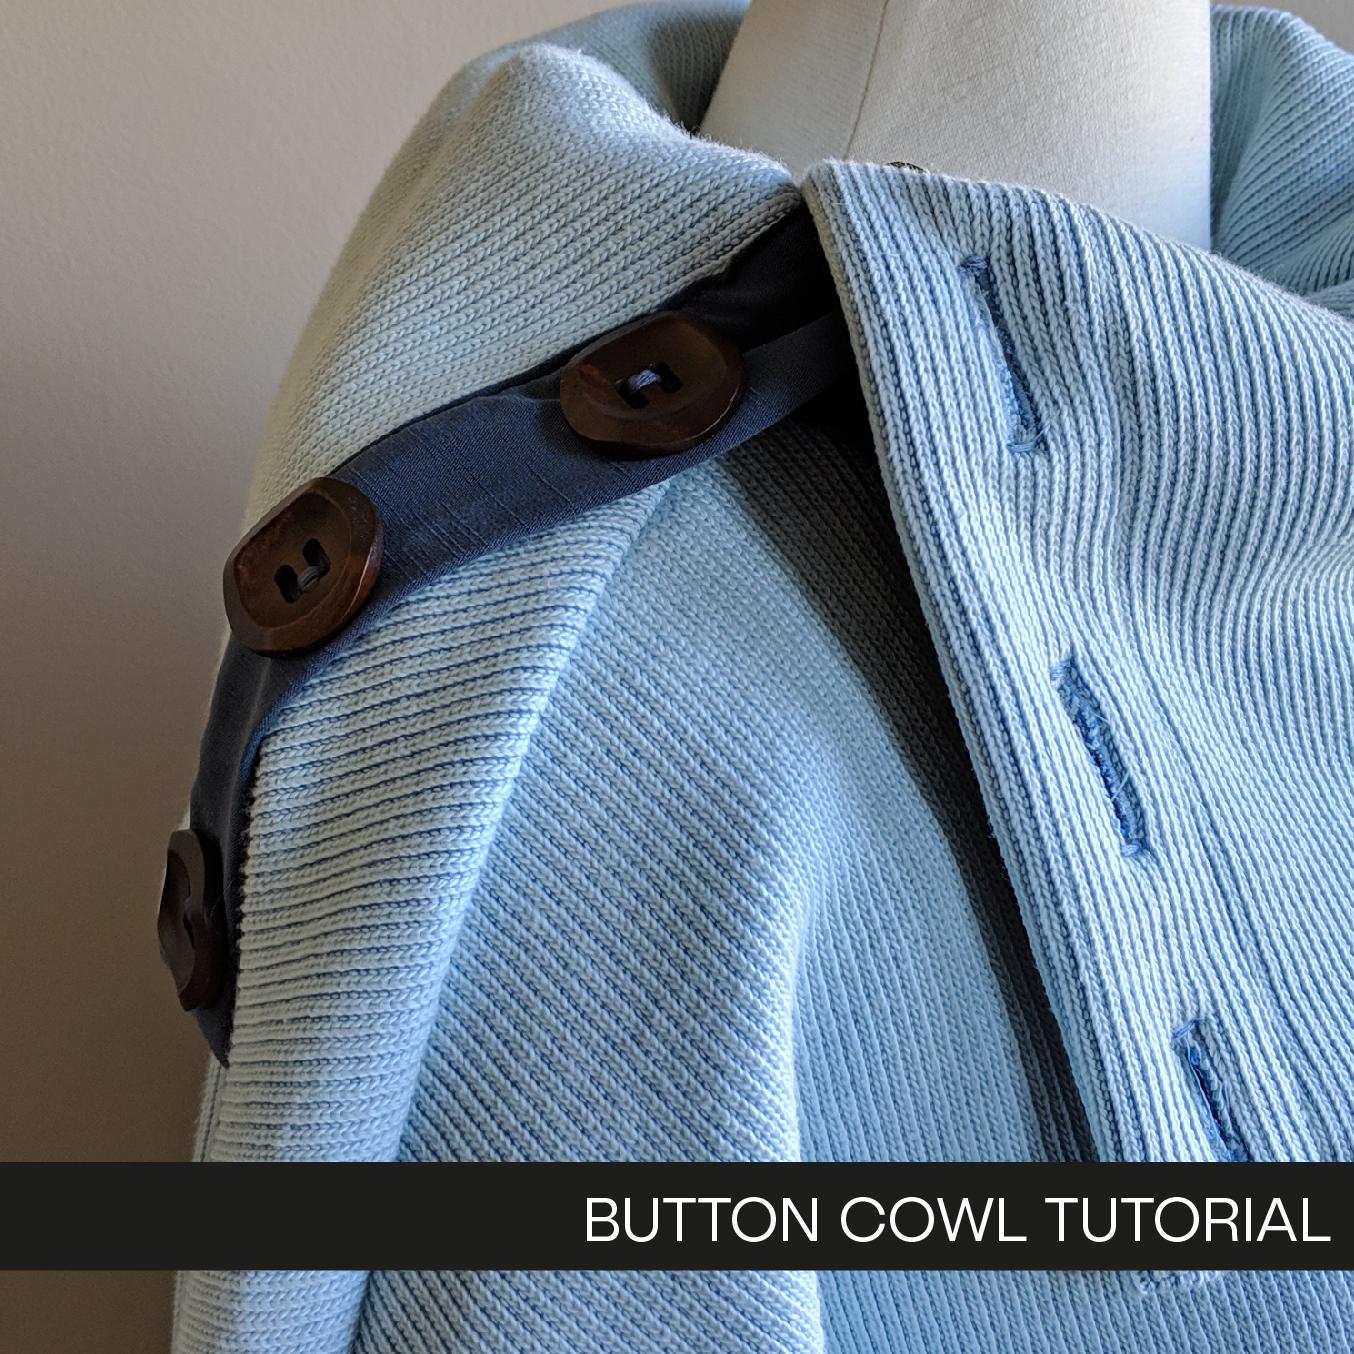 Button Cowl Tutorial